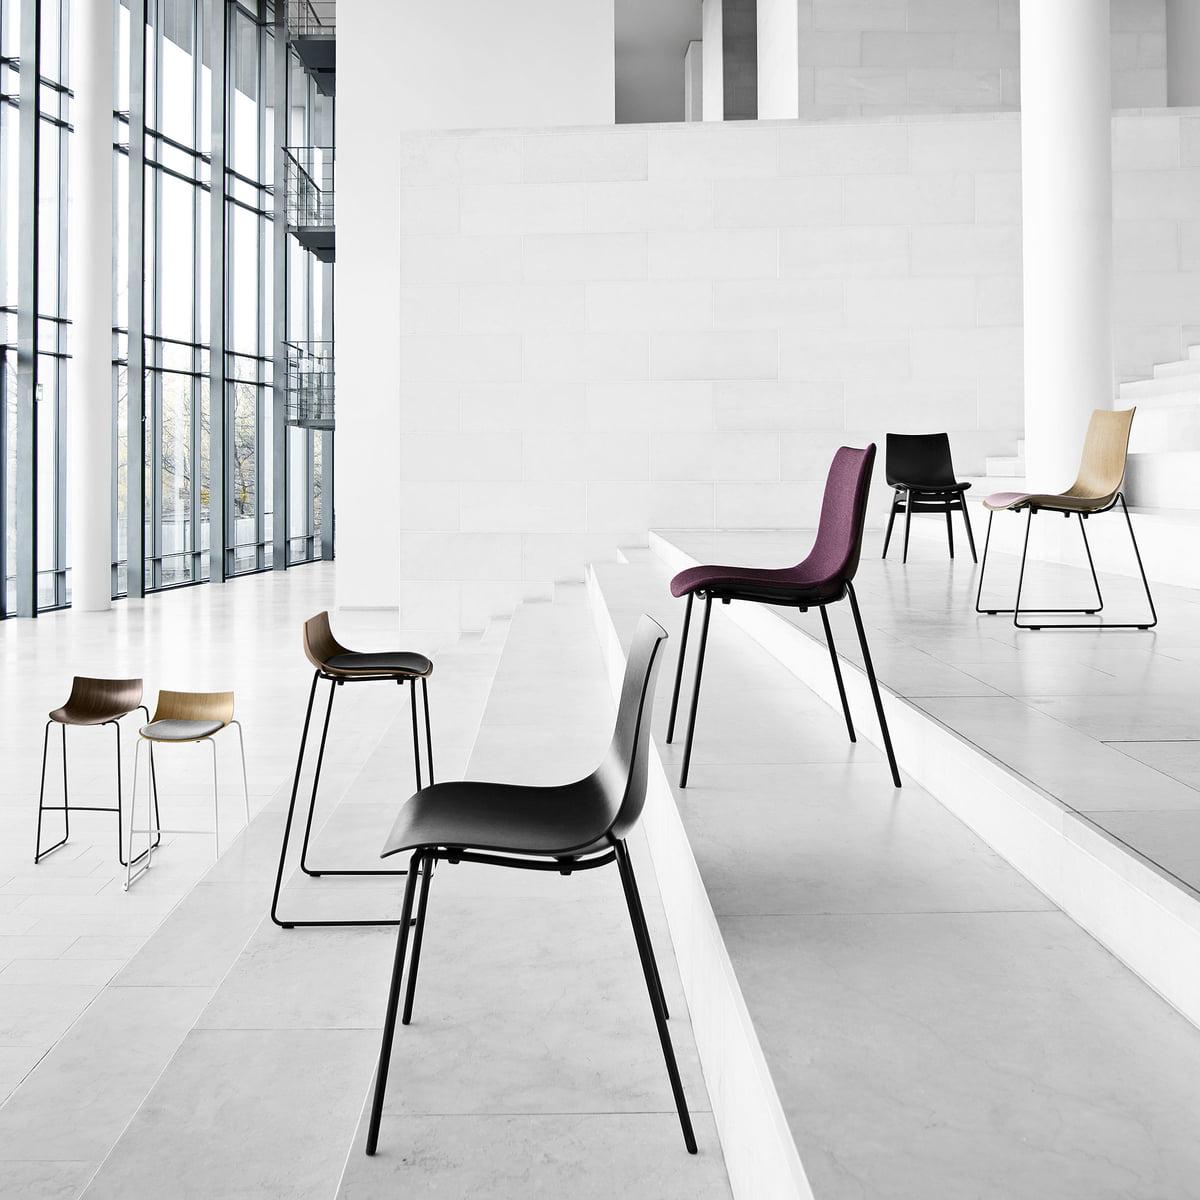 ba001t preludia stuhl von carl hansen connox. Black Bedroom Furniture Sets. Home Design Ideas